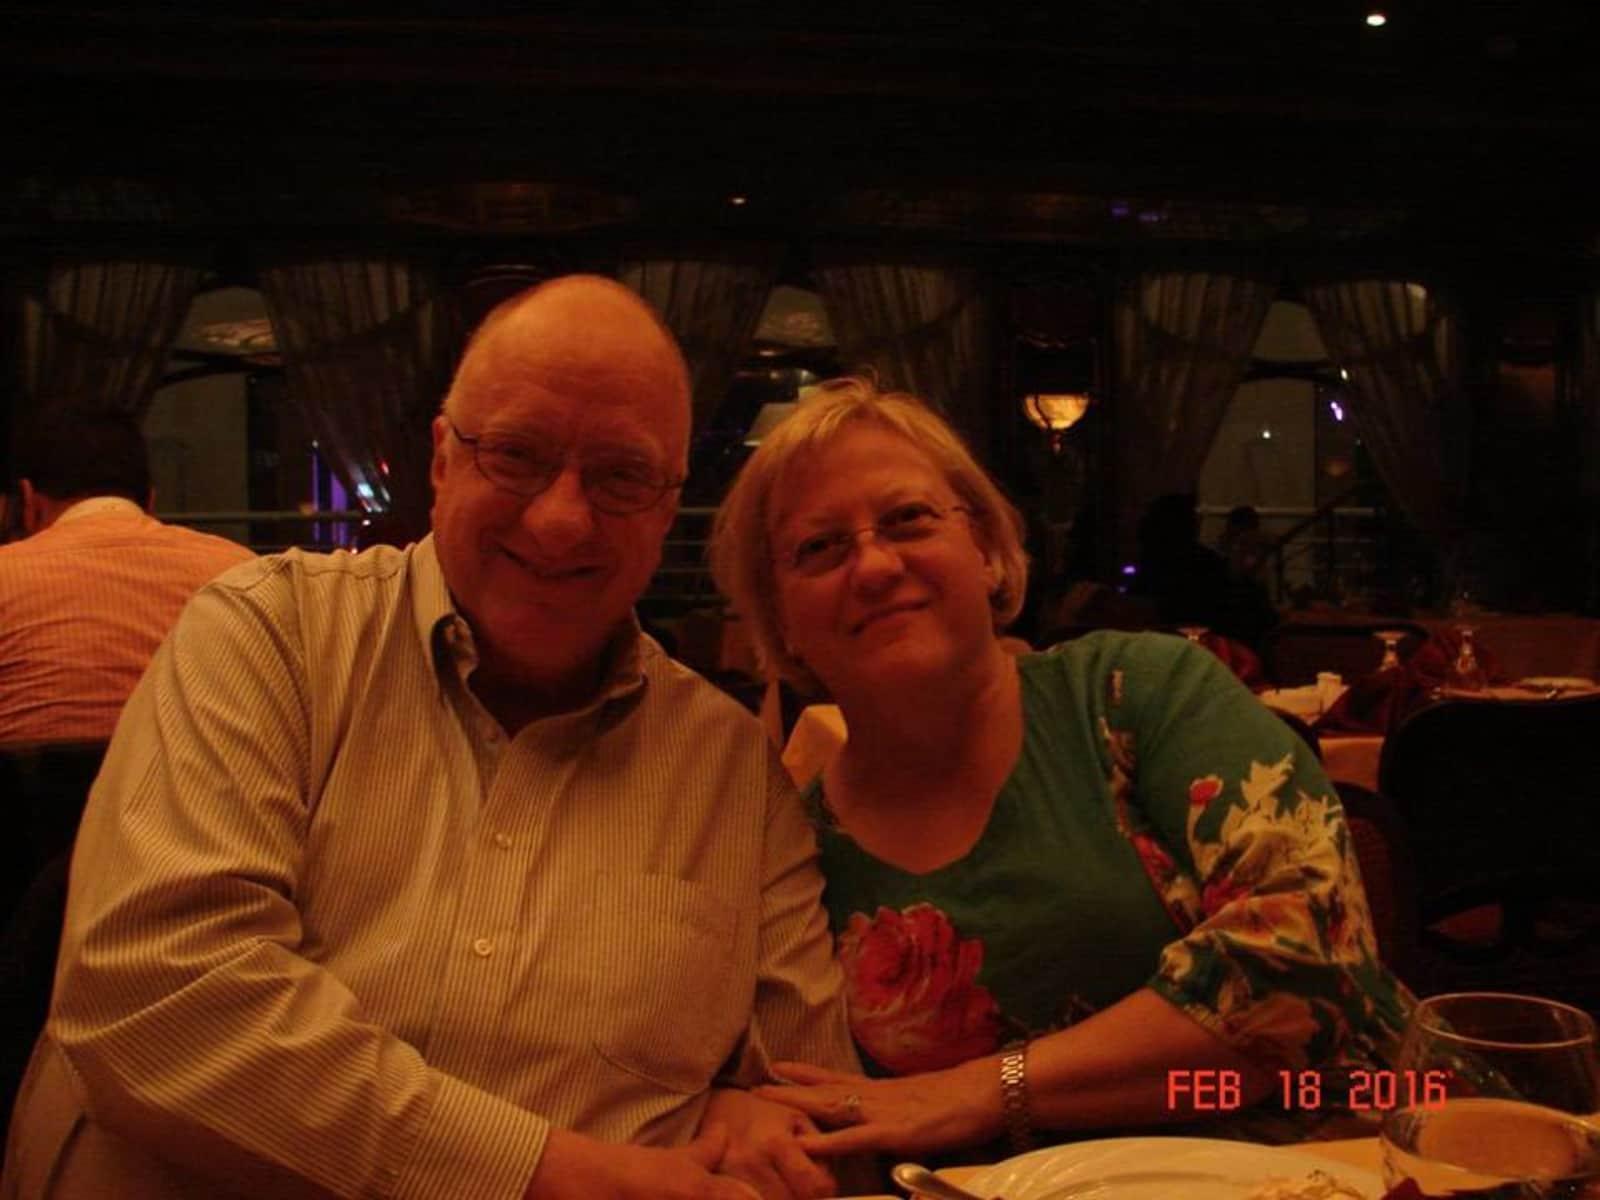 Cynthia & Carroll from Waco, Texas, United States